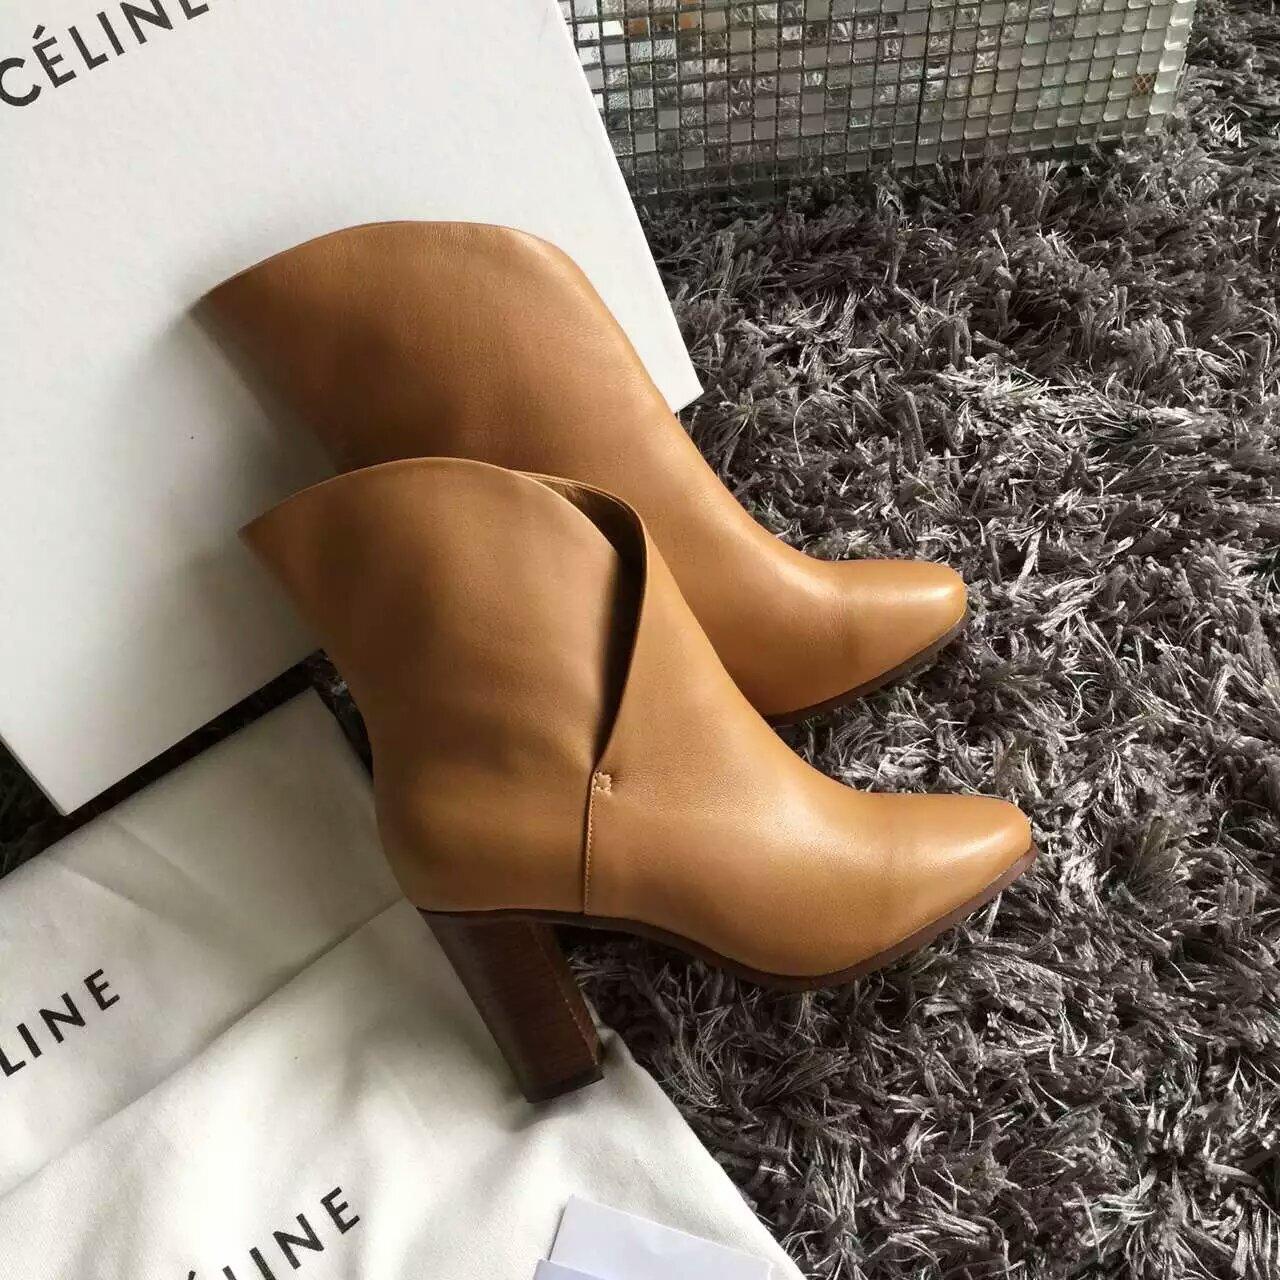 Celine2016款真皮女士短靴